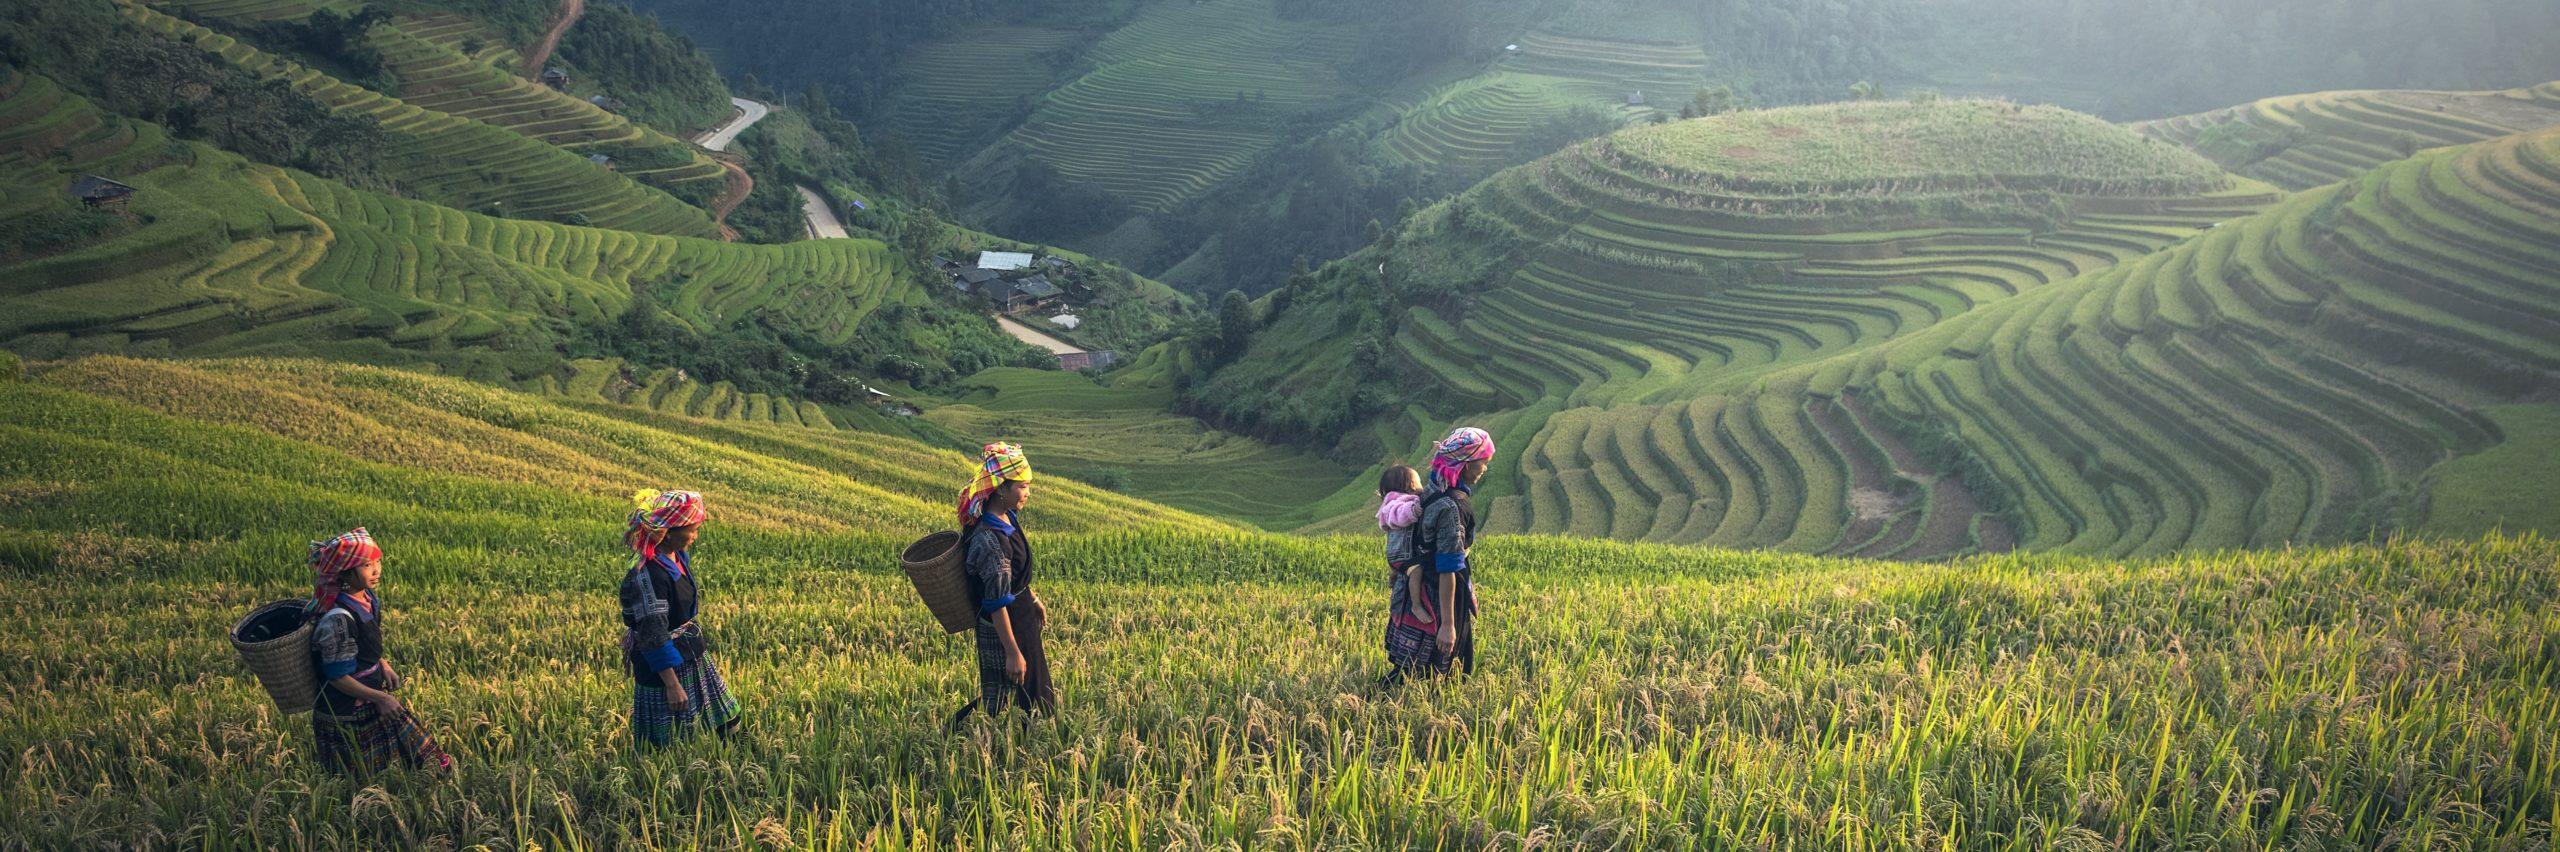 Women walking through rice terraces. (Pixabay; 2016)